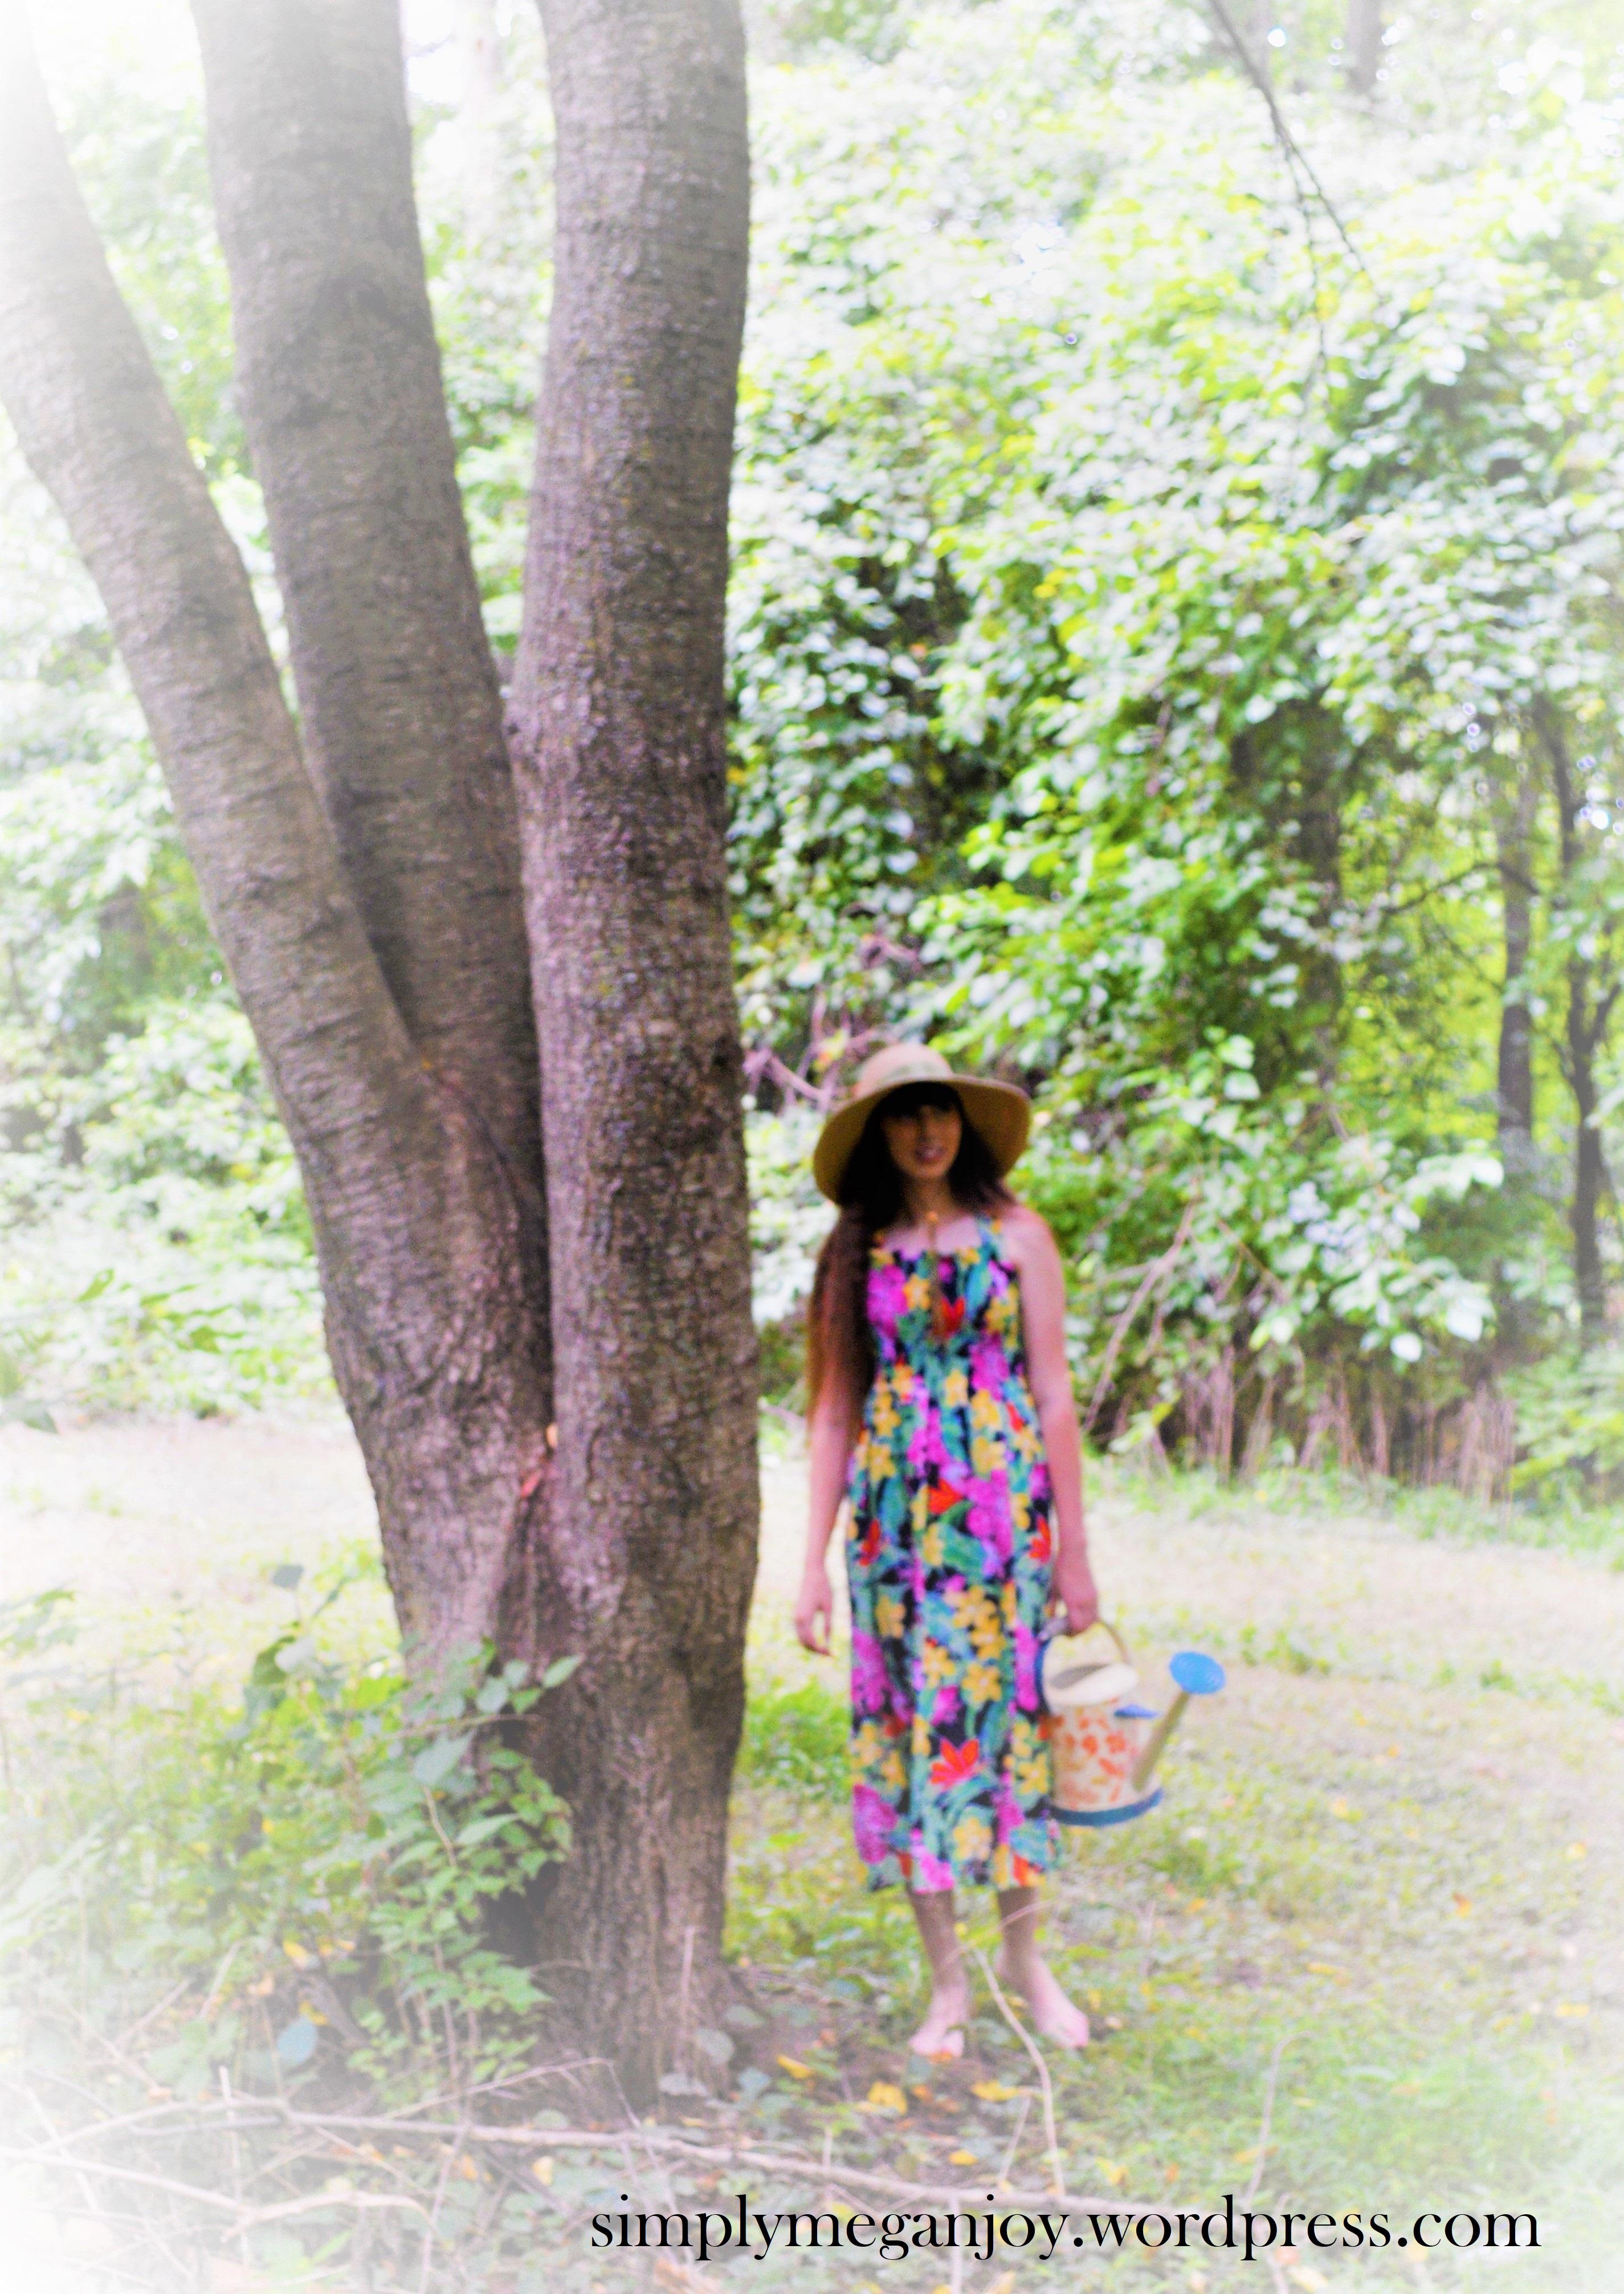 SIY (Sew It Yourself) - Gardening Dress simplymeganjoy.wordpress.com 2